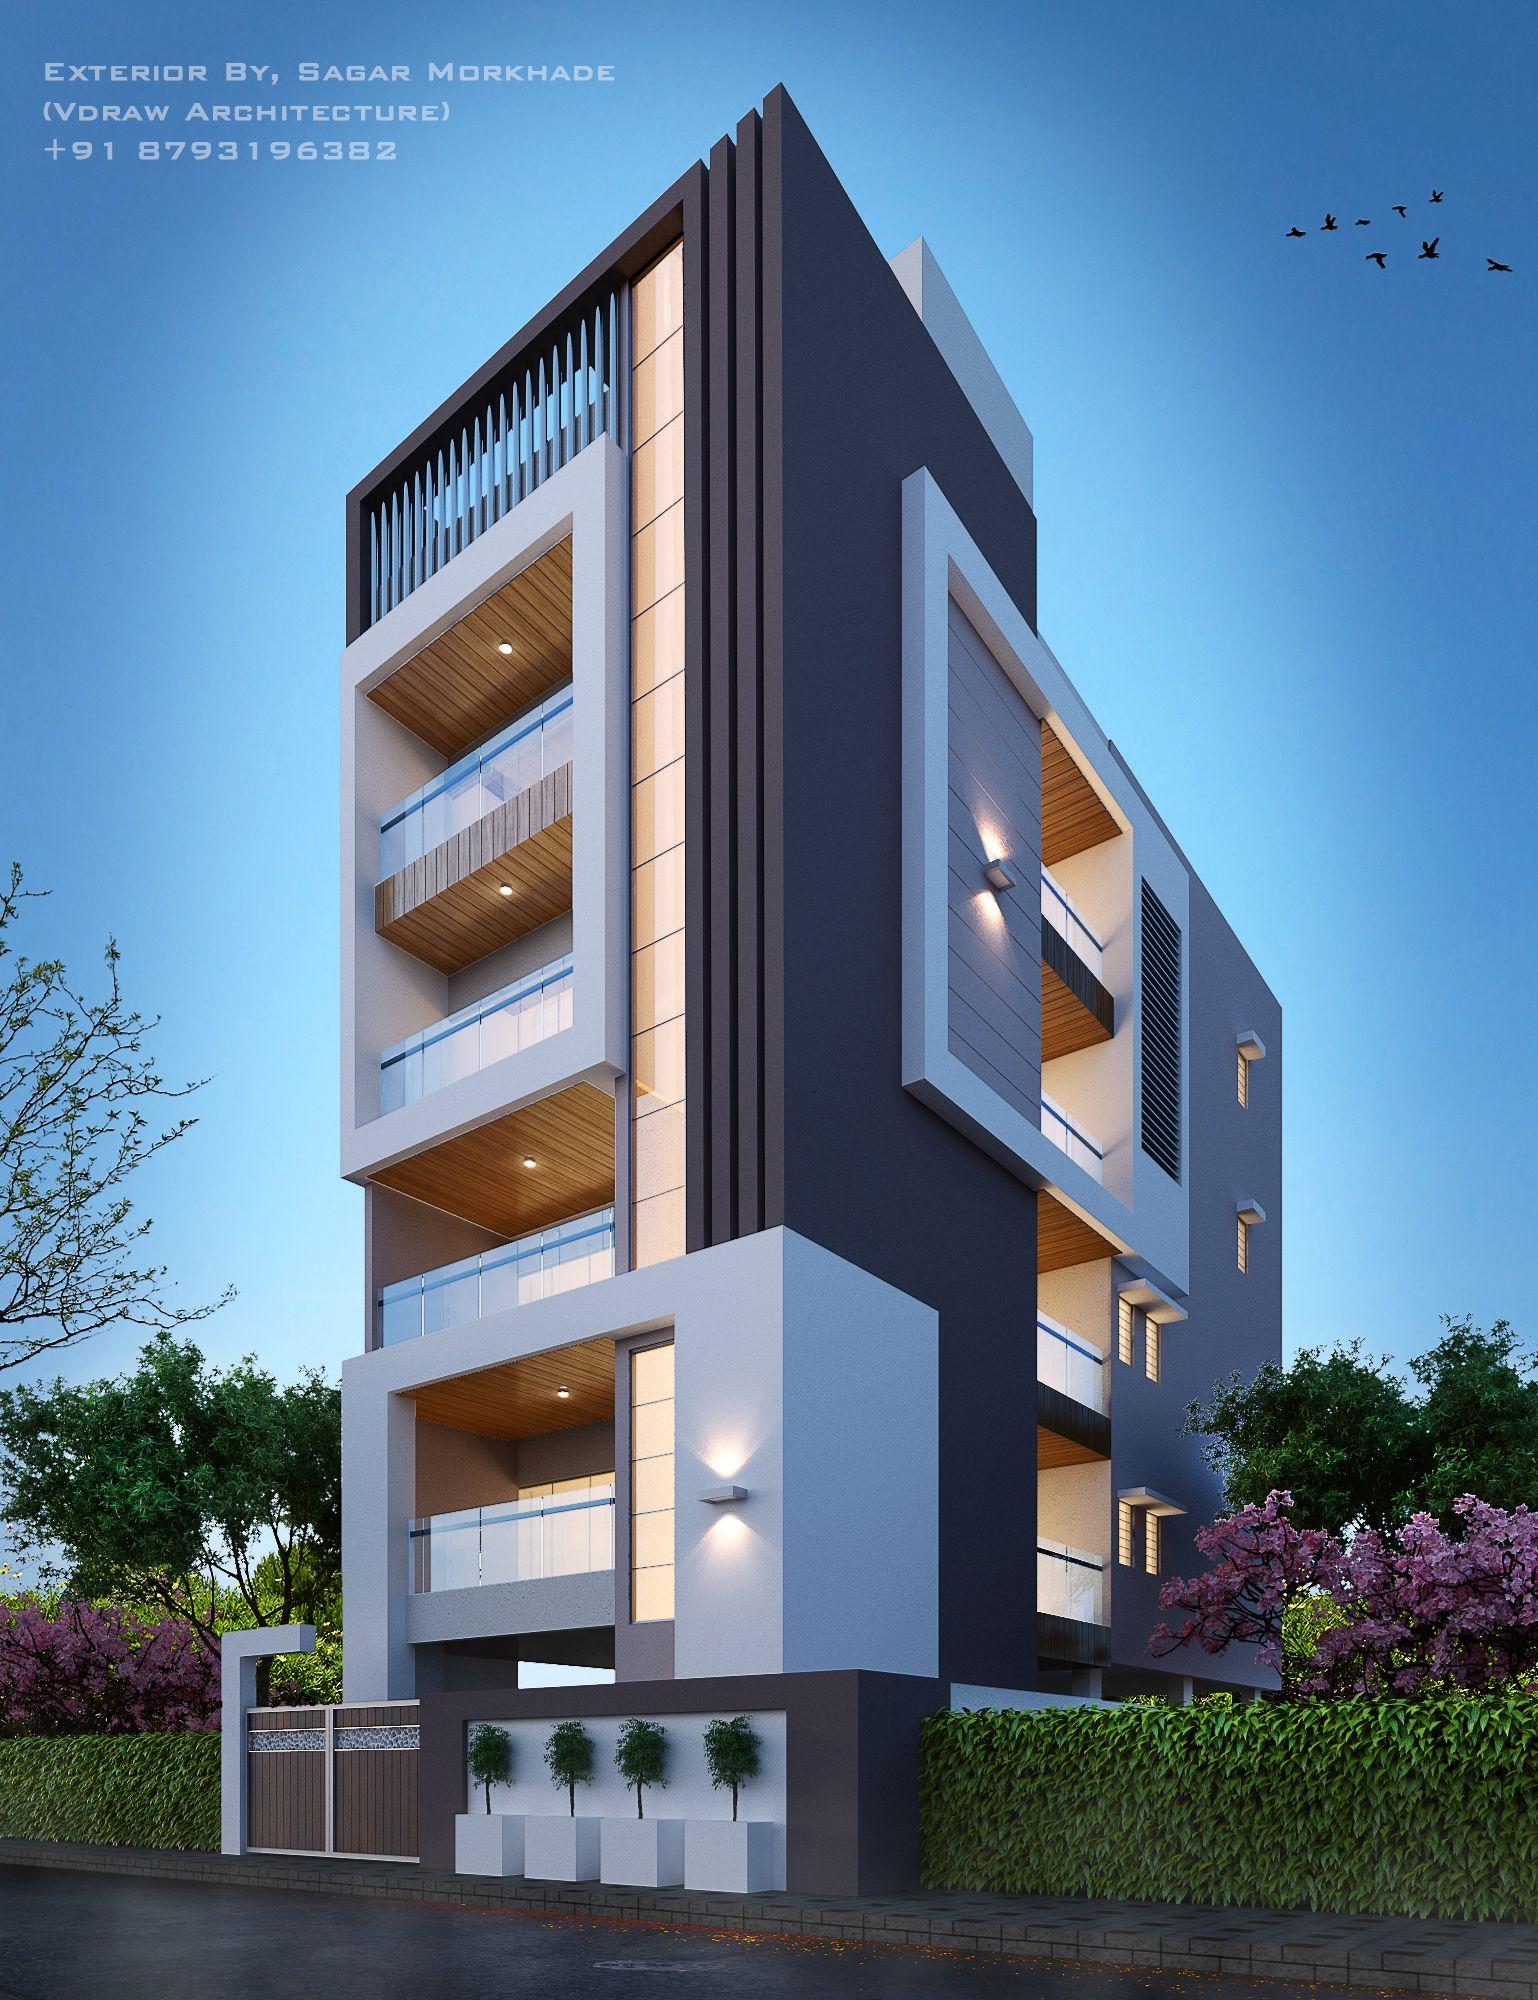 Modern Residential Flat Scheme Exterior By Sagar Morkhade Vdraw Architecture 91 8793196382